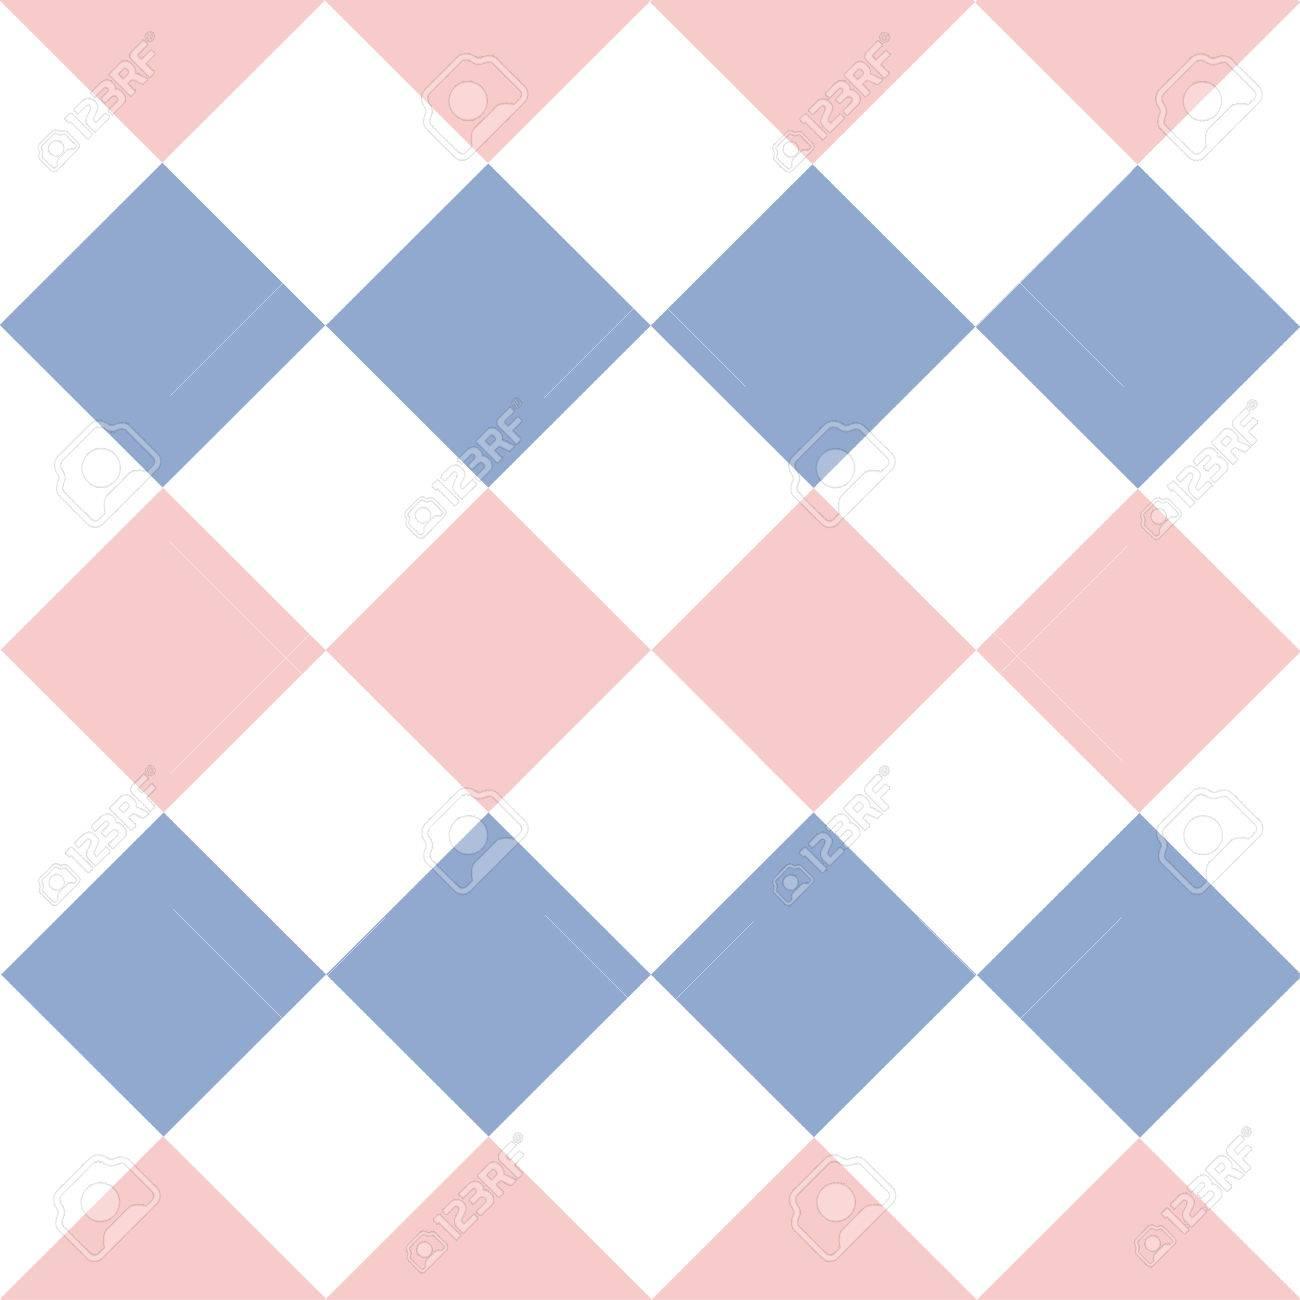 Rose Quartz Serenity White Diamond Background Vector Illustration